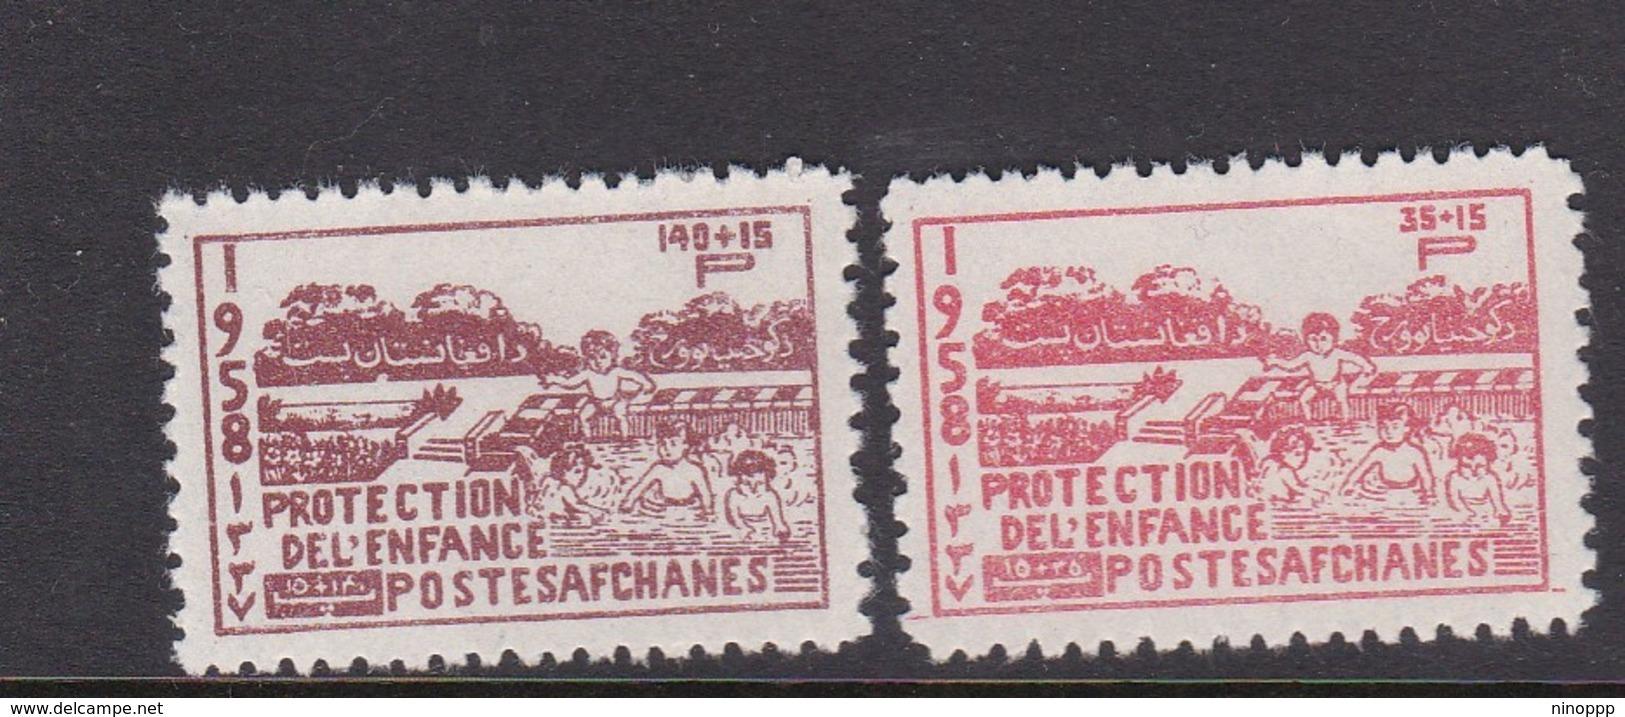 Afghanistan SG 426-427 1958 Child Welfare Fund MNH - Afghanistan